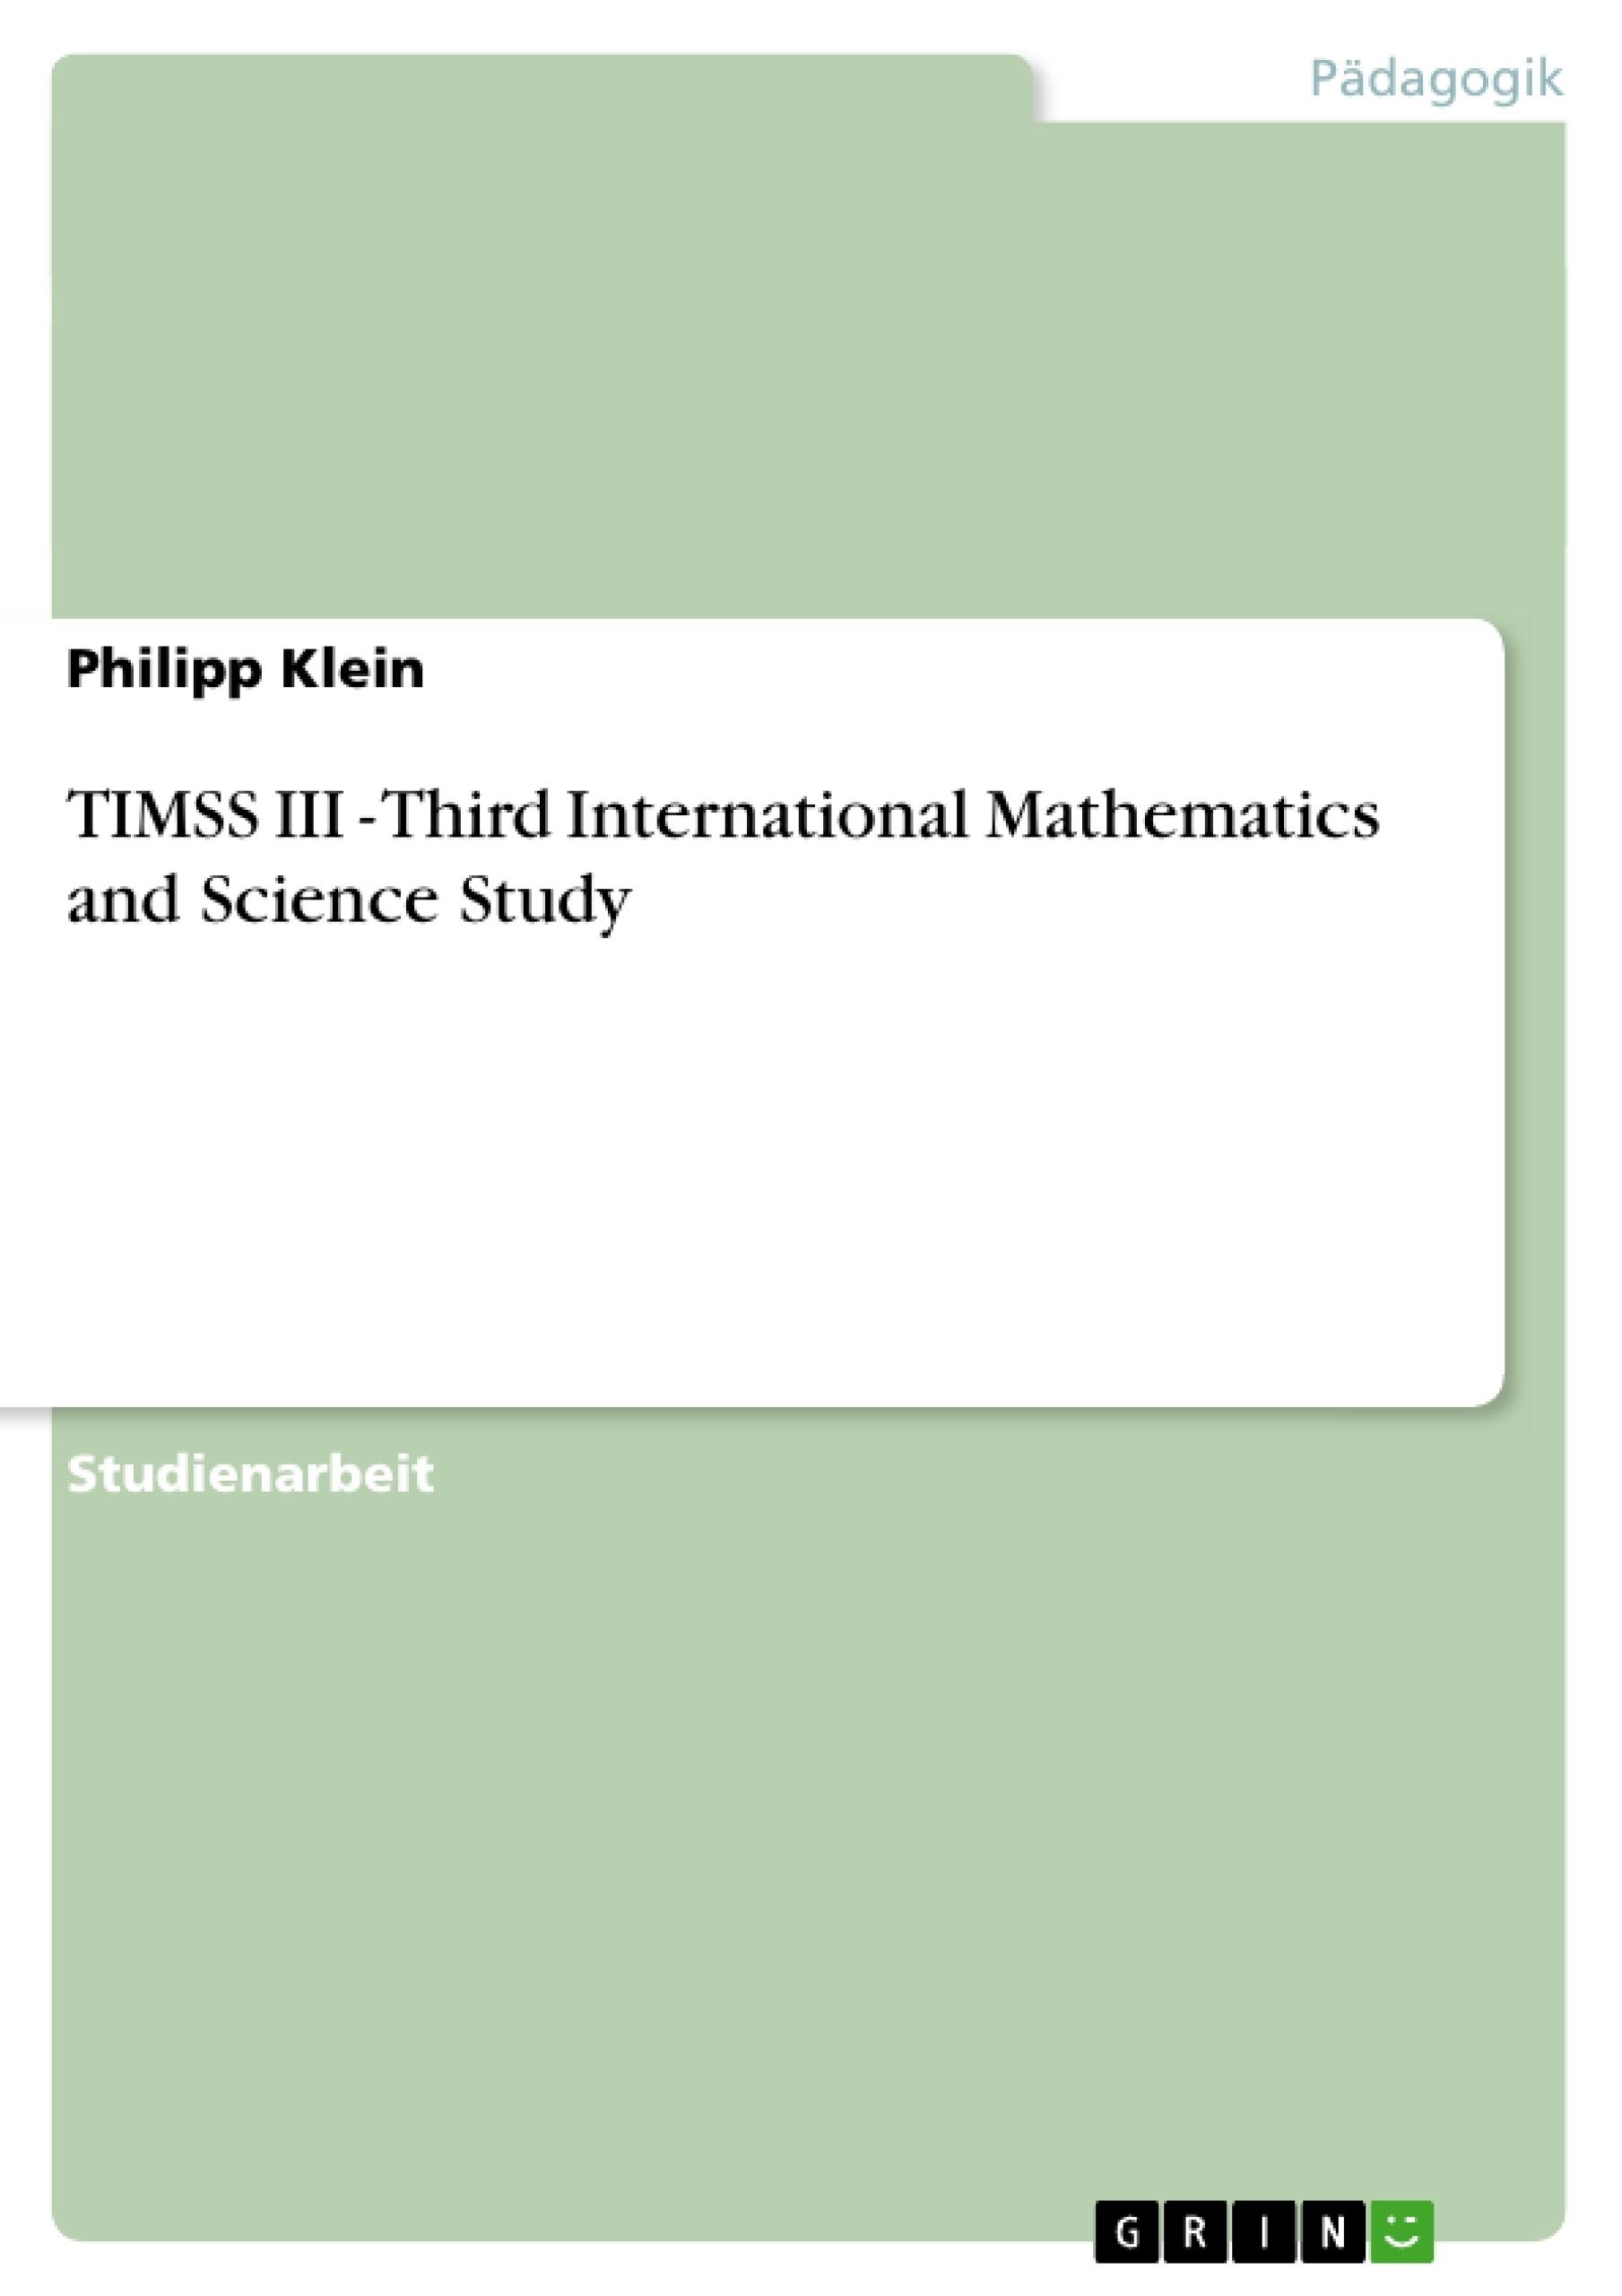 Titel: TIMSS III - Third International Mathematics and Science Study